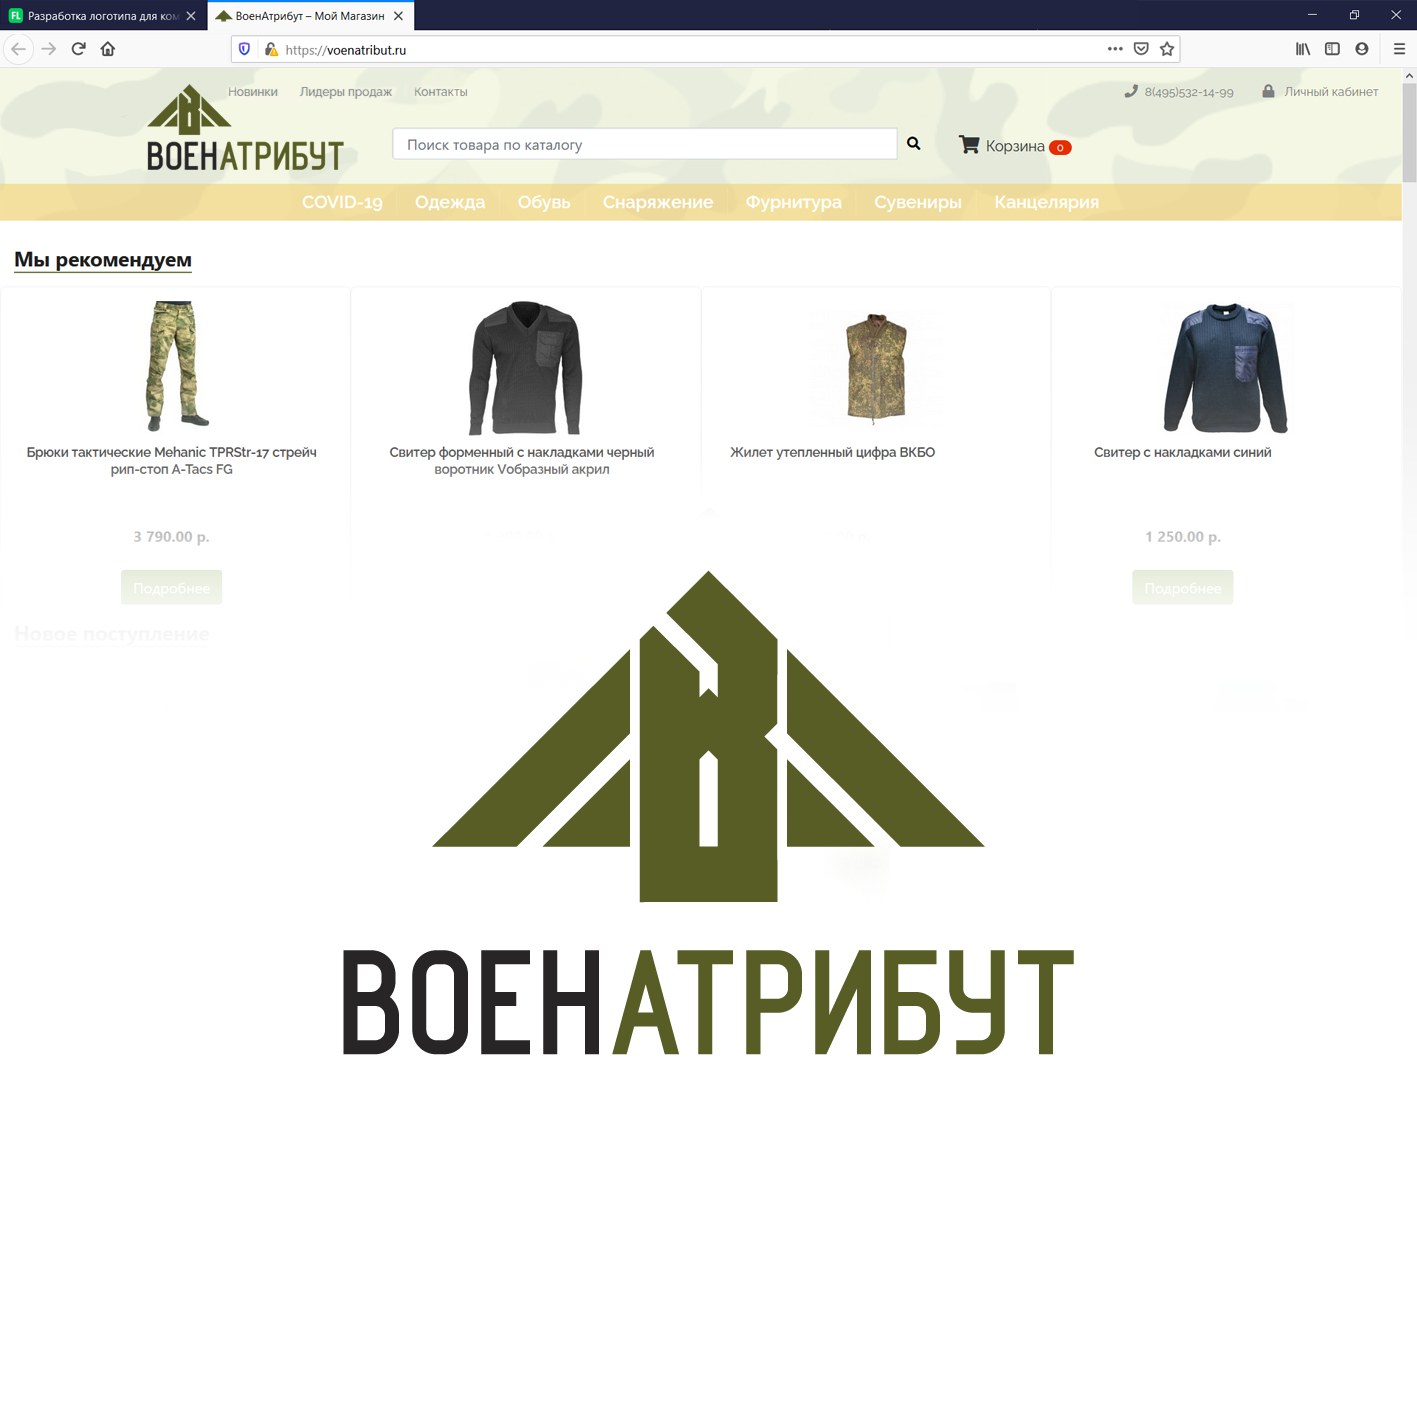 Разработка логотипа для компании военной тематики фото f_557601d4dd831b7a.png